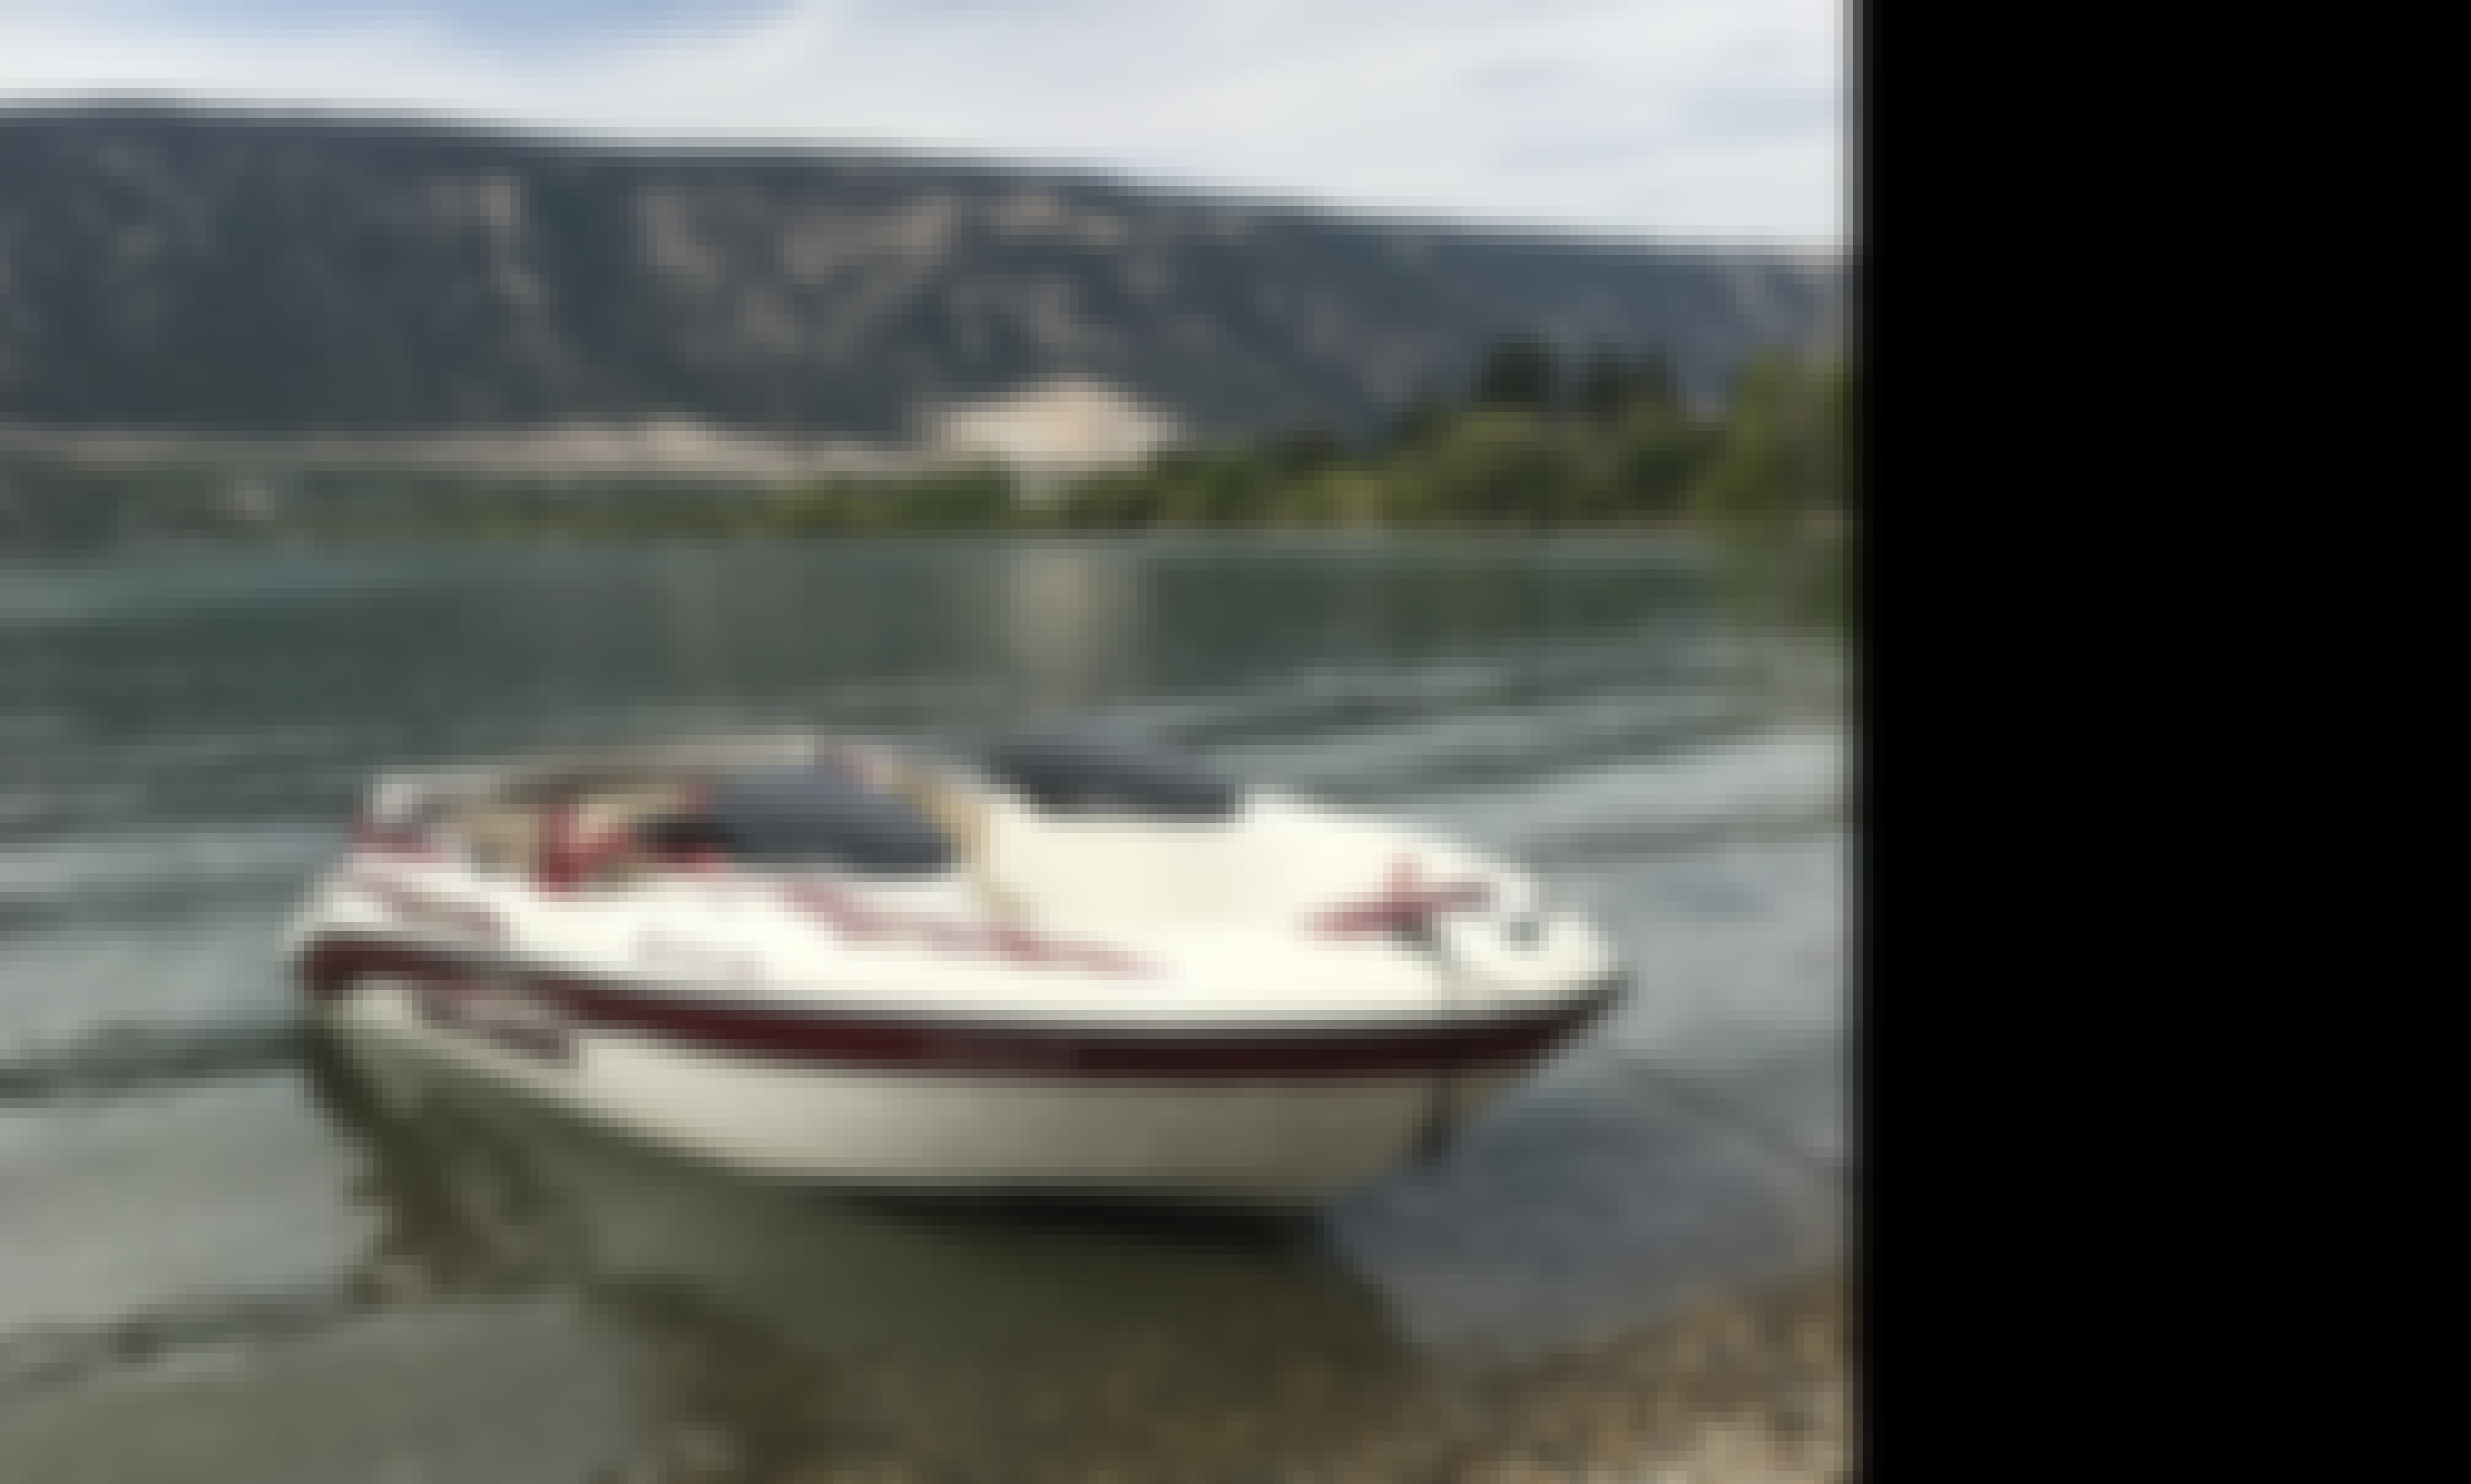 Rent this Powerboat for 7 People in Kelowna, British Columbia